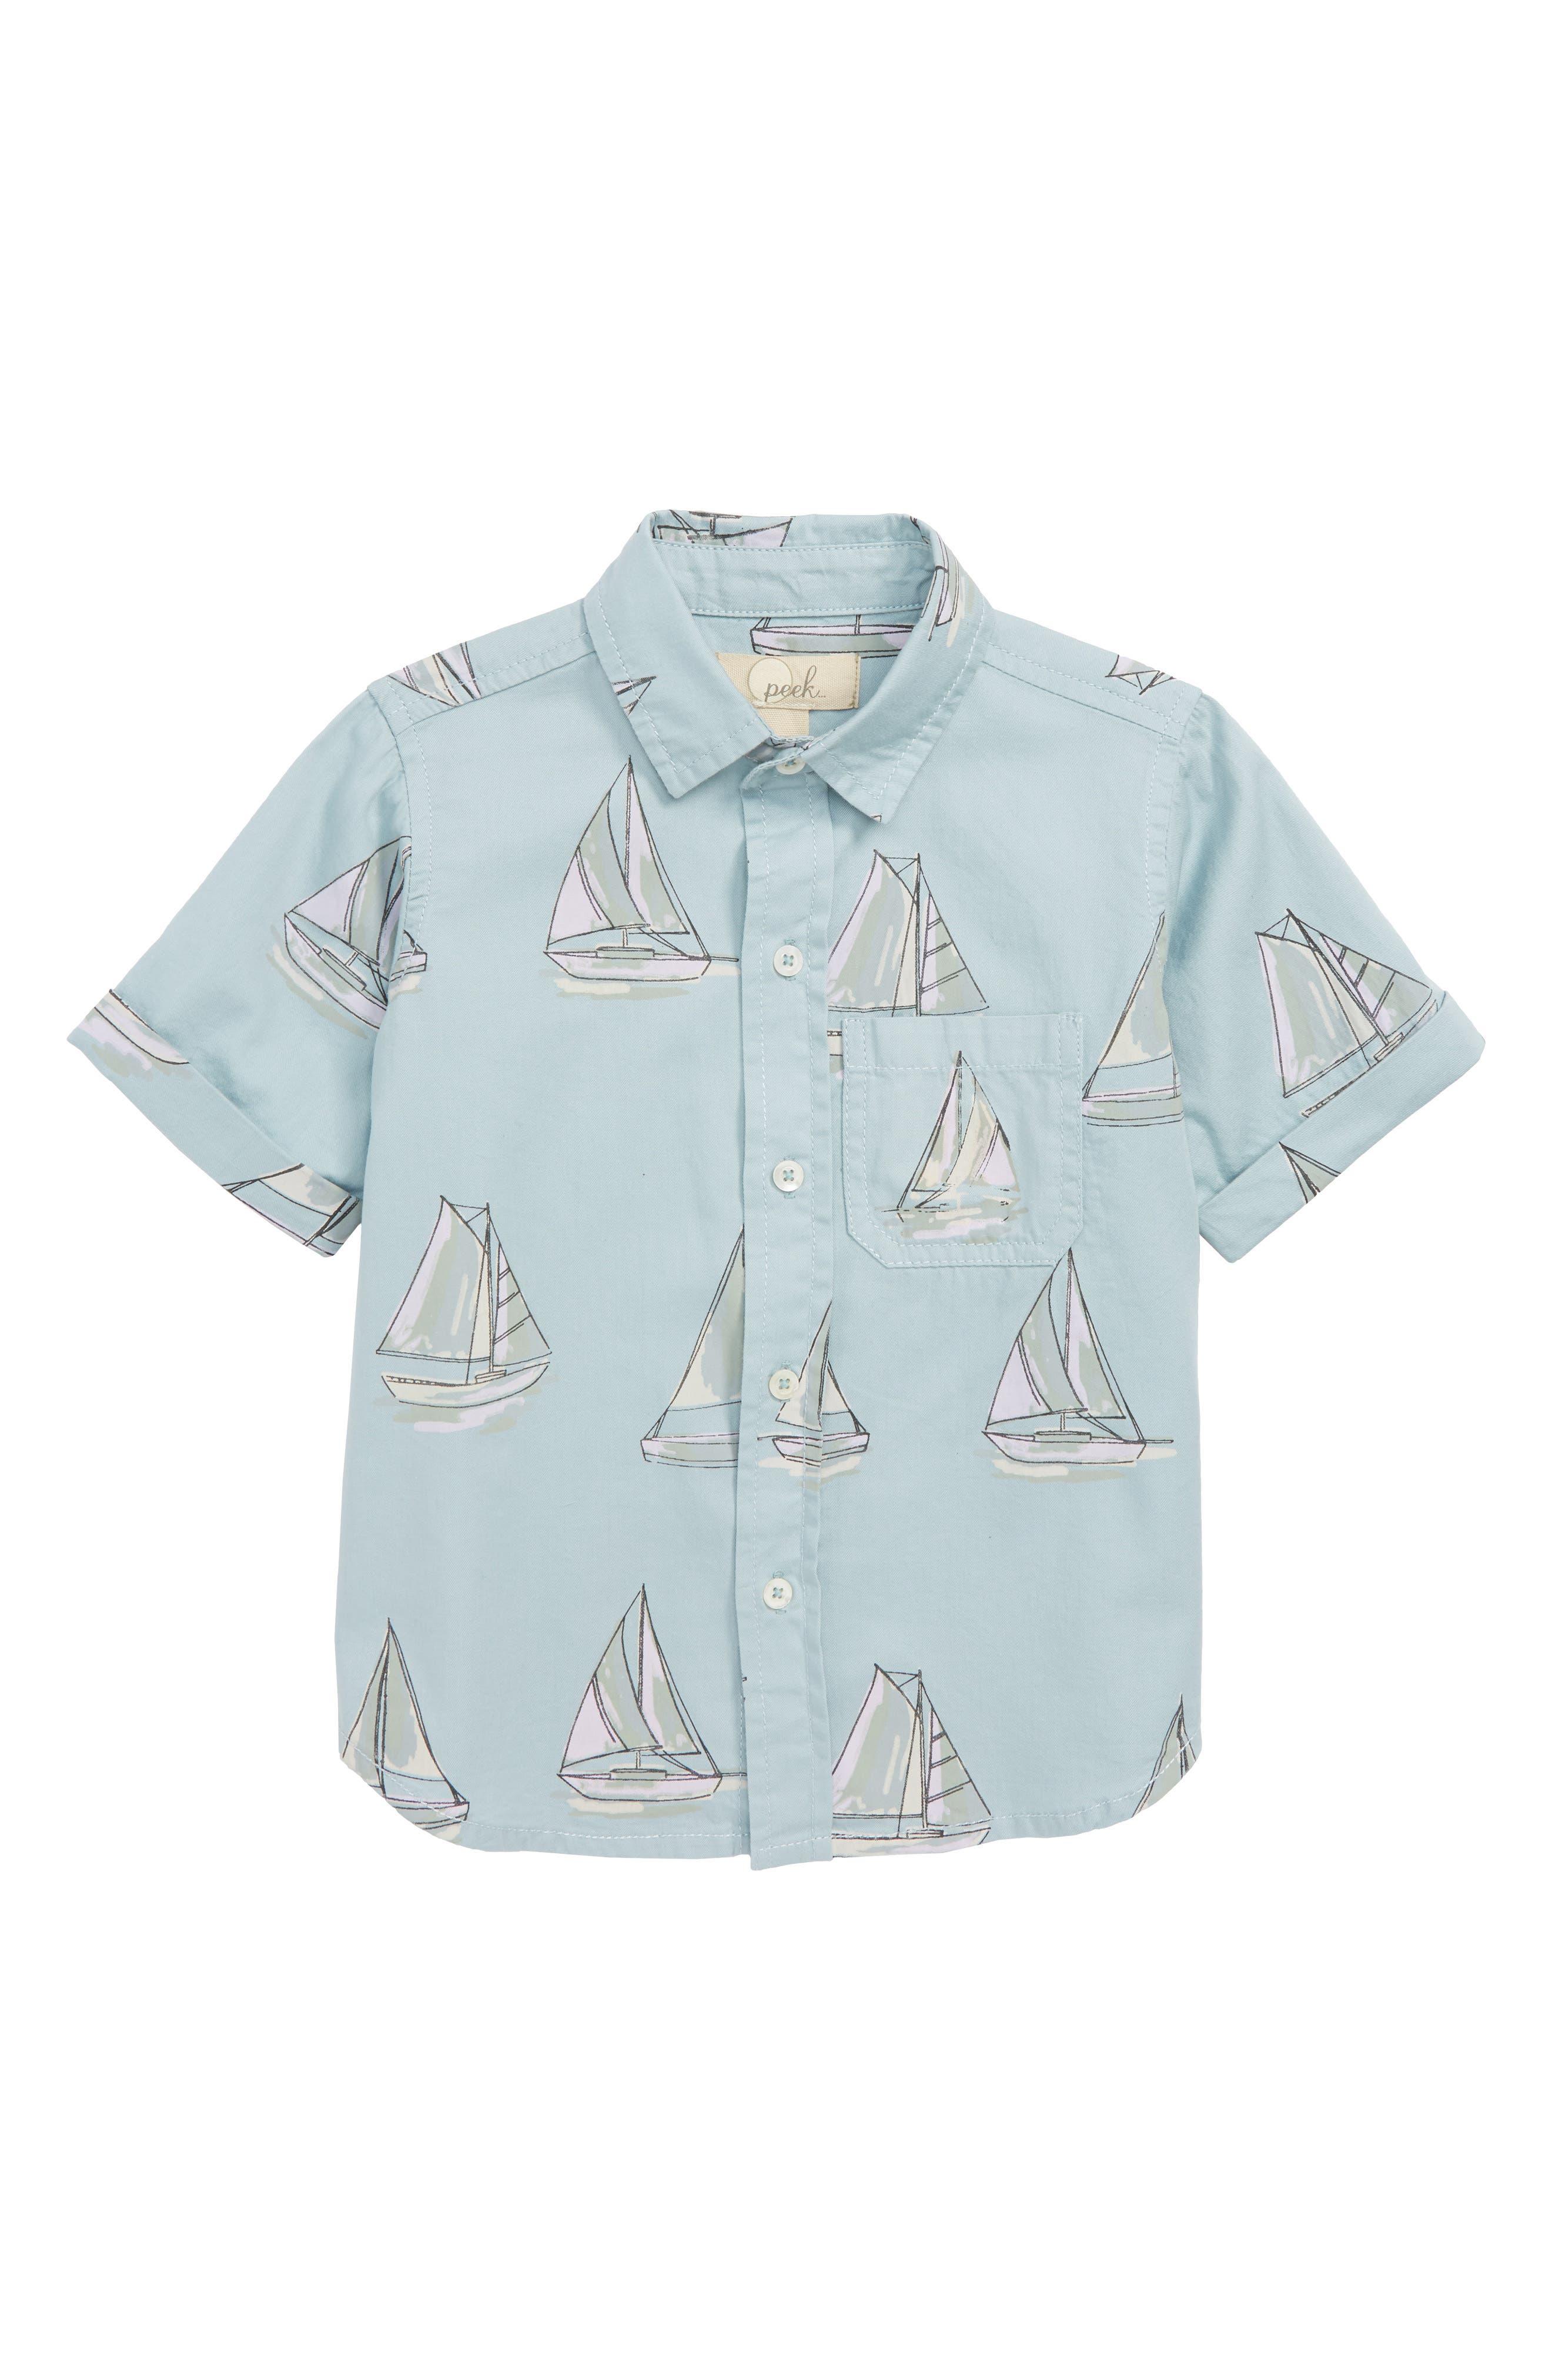 Peek Sailboat Shirt,                         Main,                         color, 400